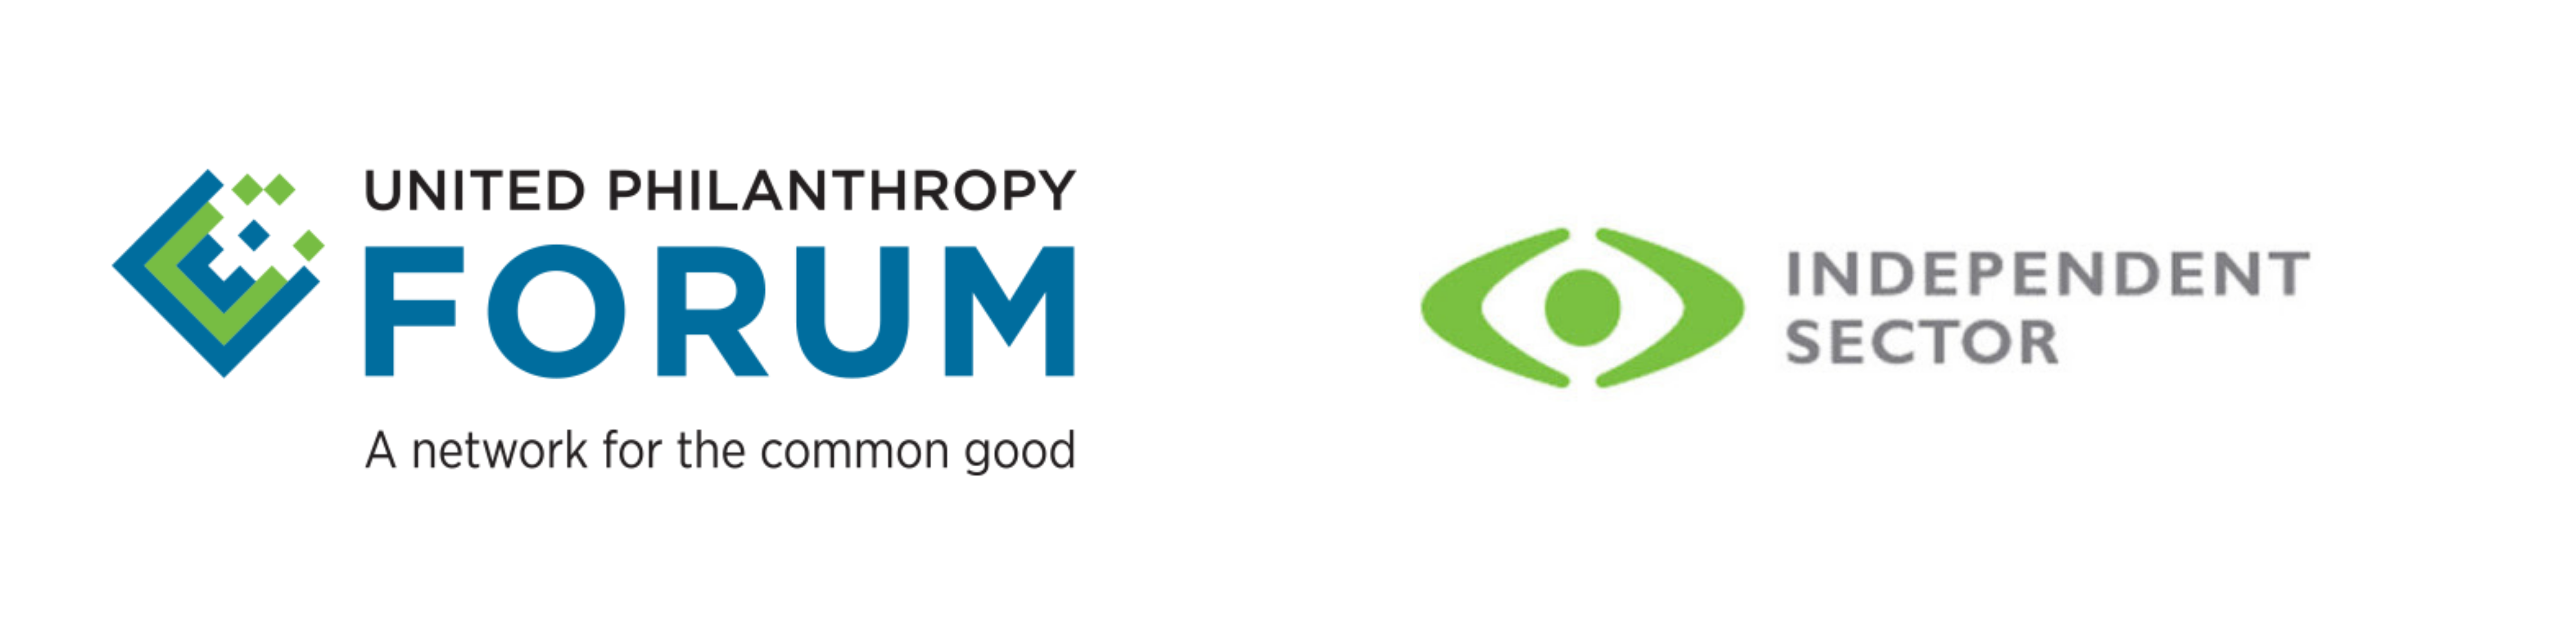 United Philanthropy Forum & Independent Sector Logos